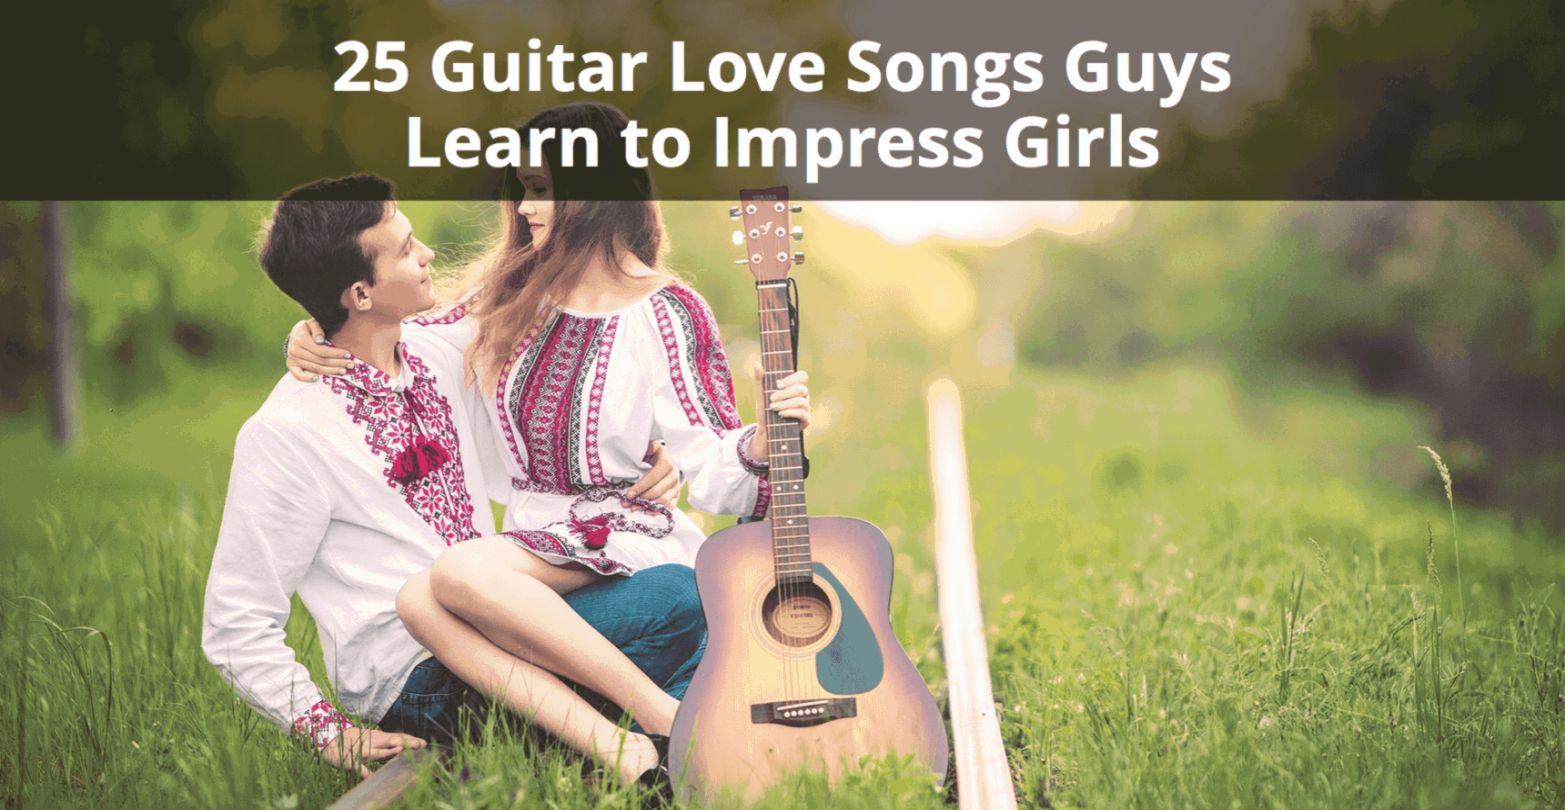 25 Guitar Love Songs Guys Learn to Impress Girls Musician Tuts